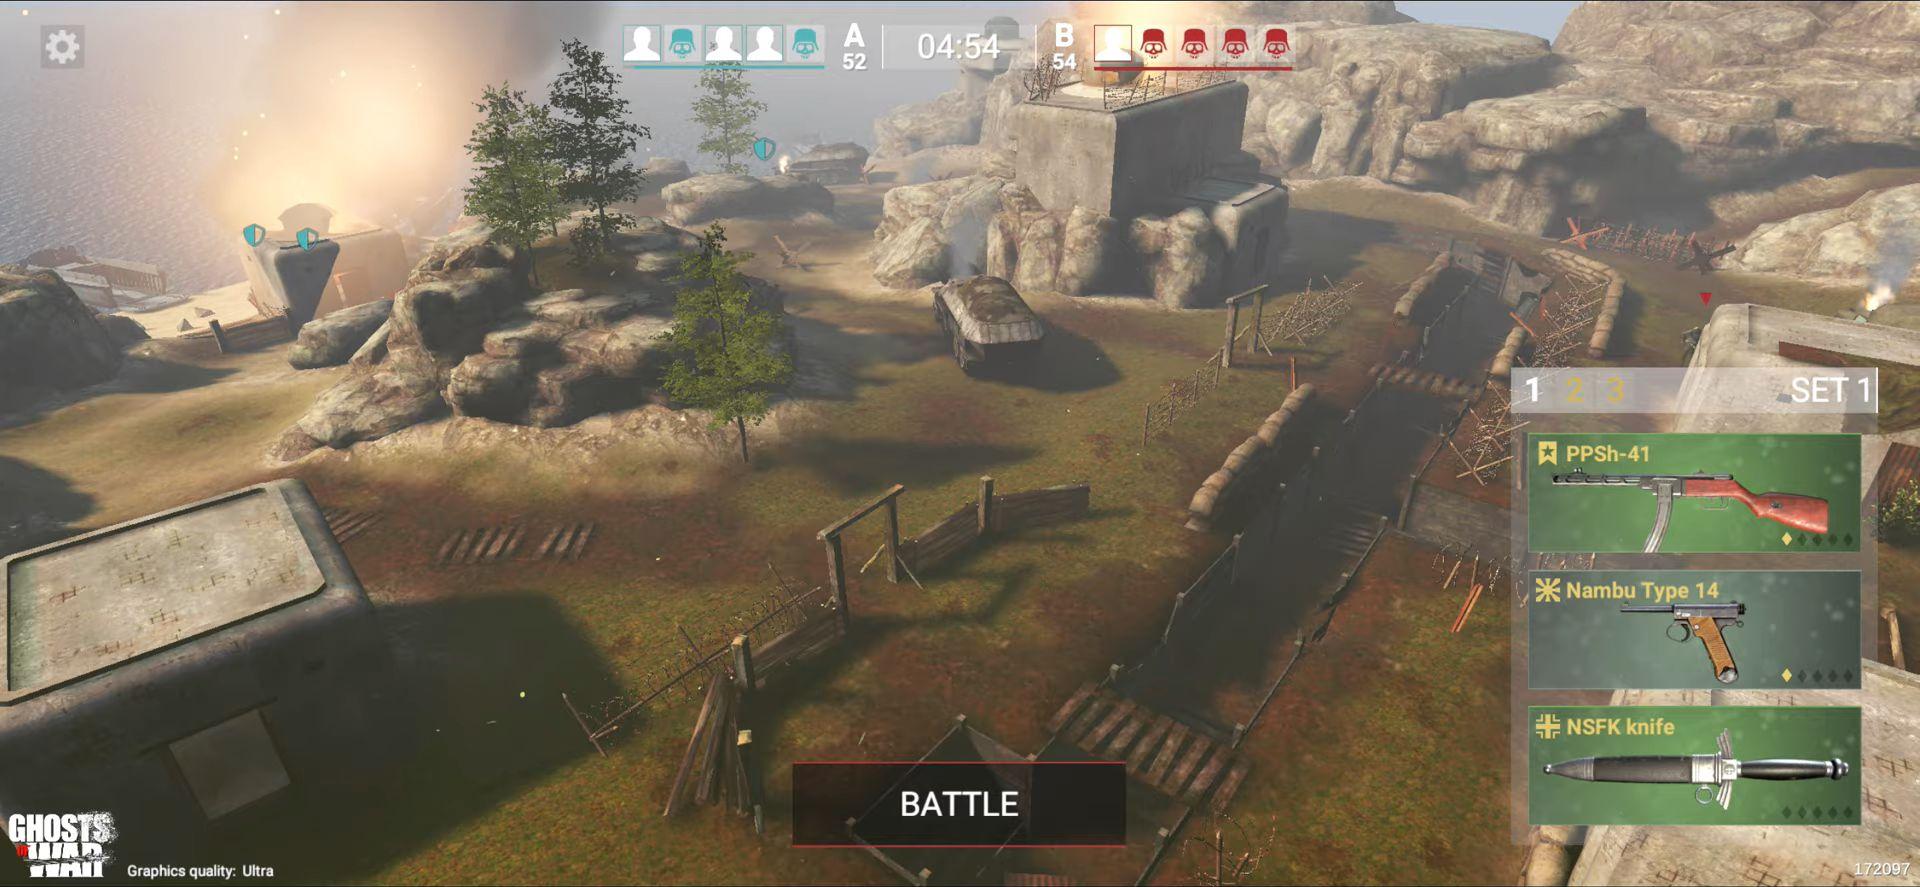 Ghosts of War: WW2 Shooting games captura de pantalla 1